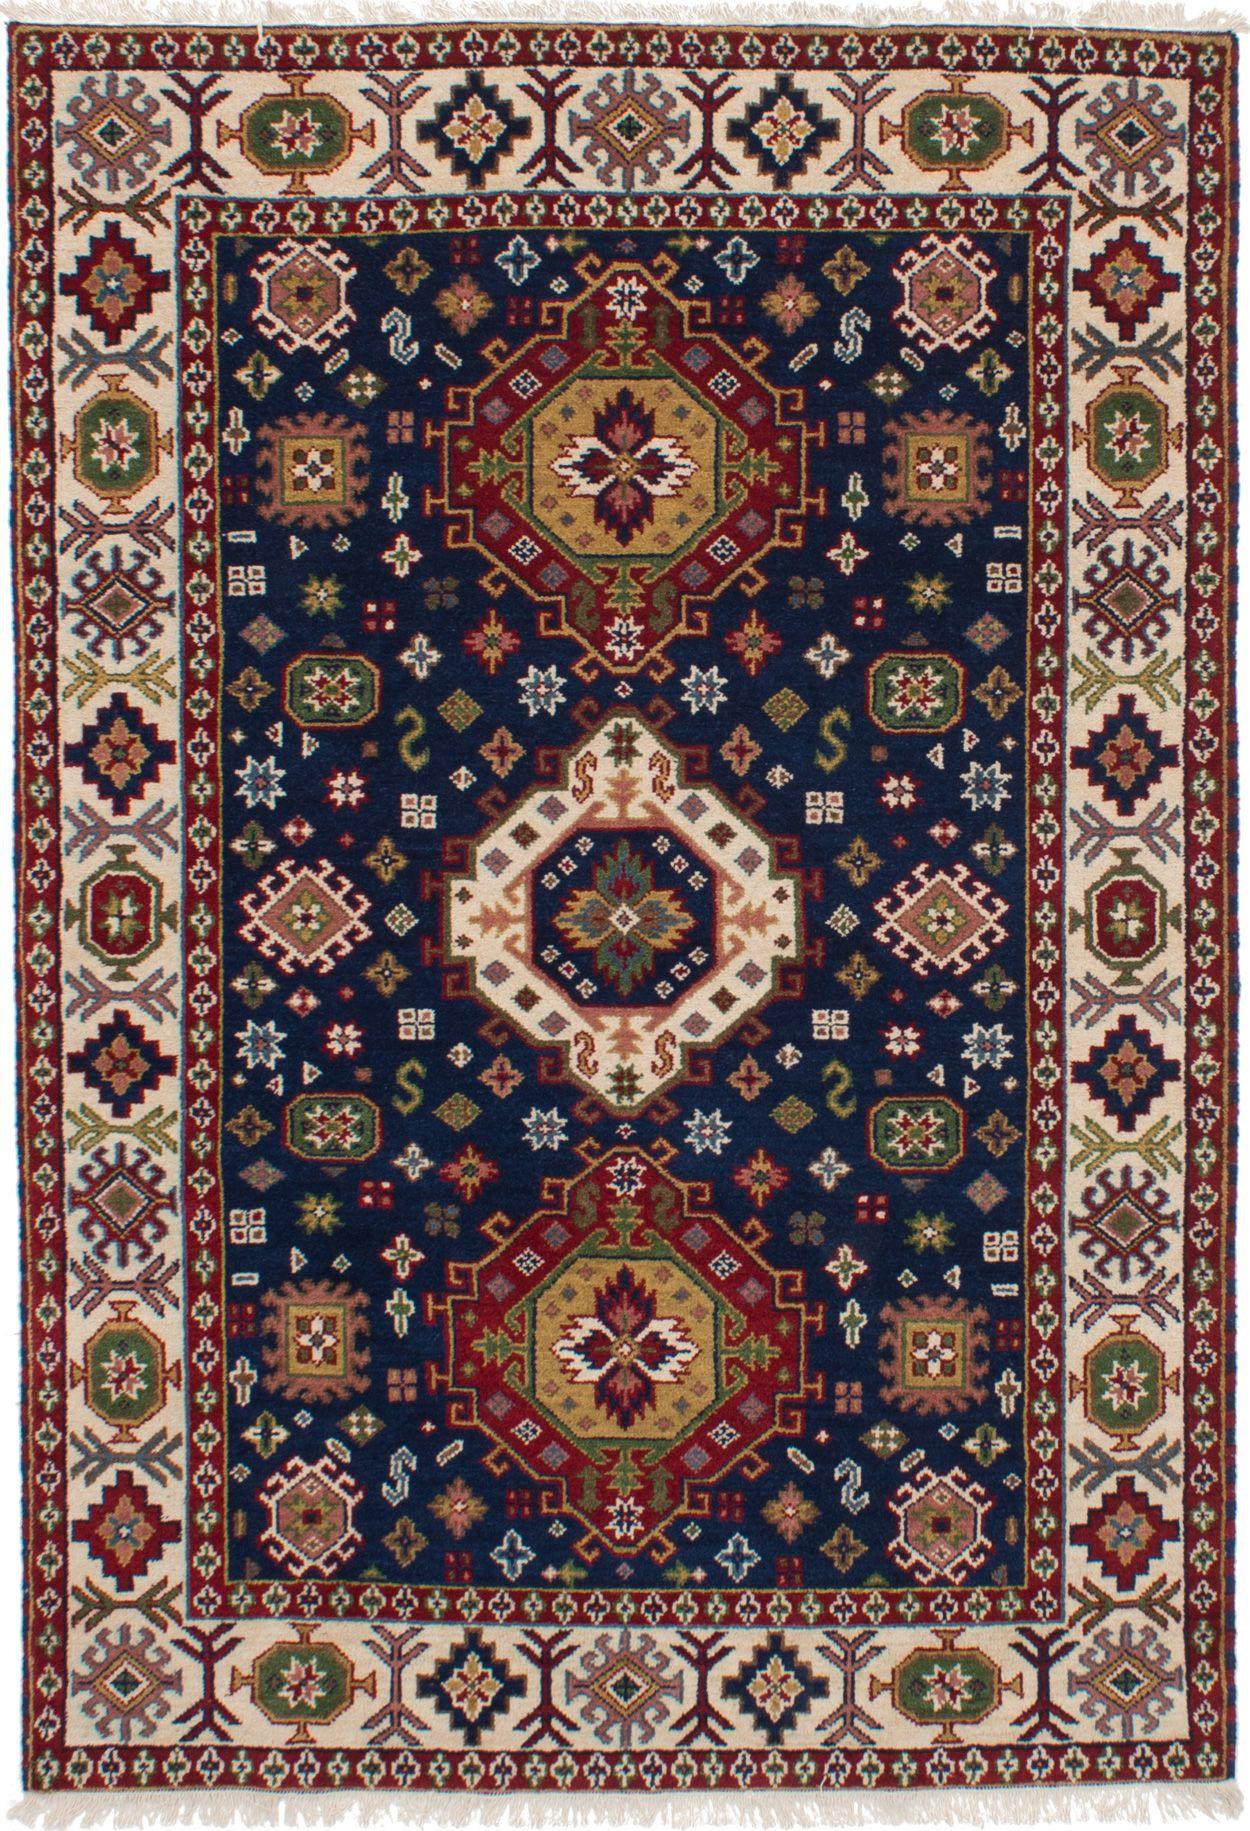 "Hand-knotted Finest Kazak Navy Blue Wool Rug 5'3"" x 7'8"" Size: 5'3"" x 7'8"""